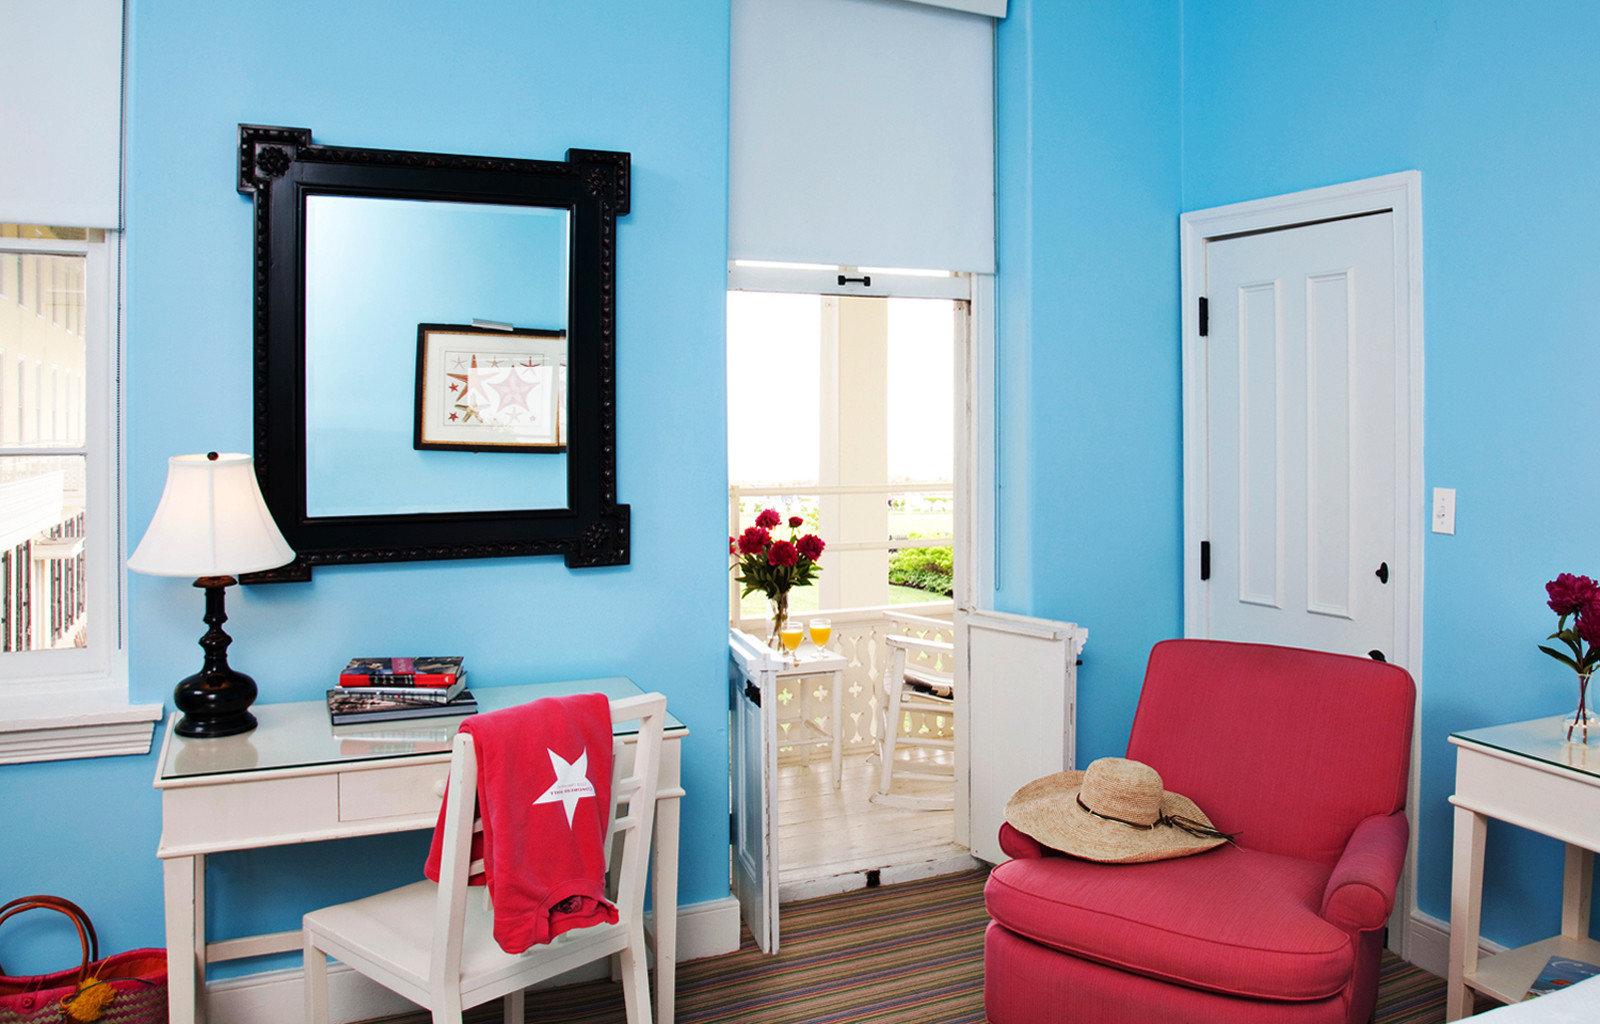 Bedroom Historic color blue property living room home Suite cottage